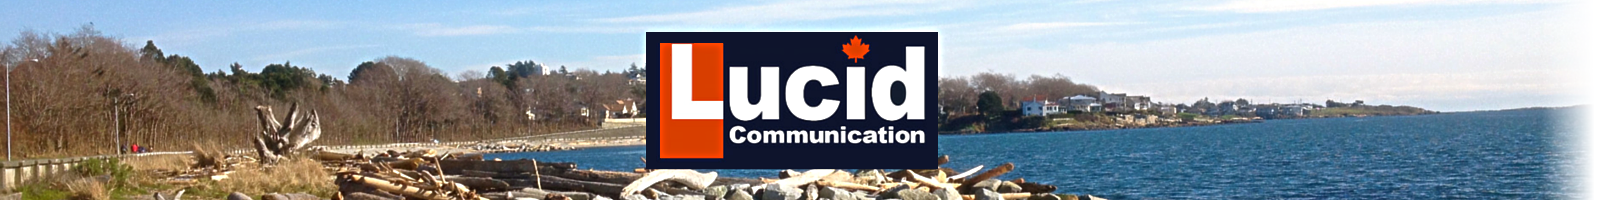 lucidcommunication